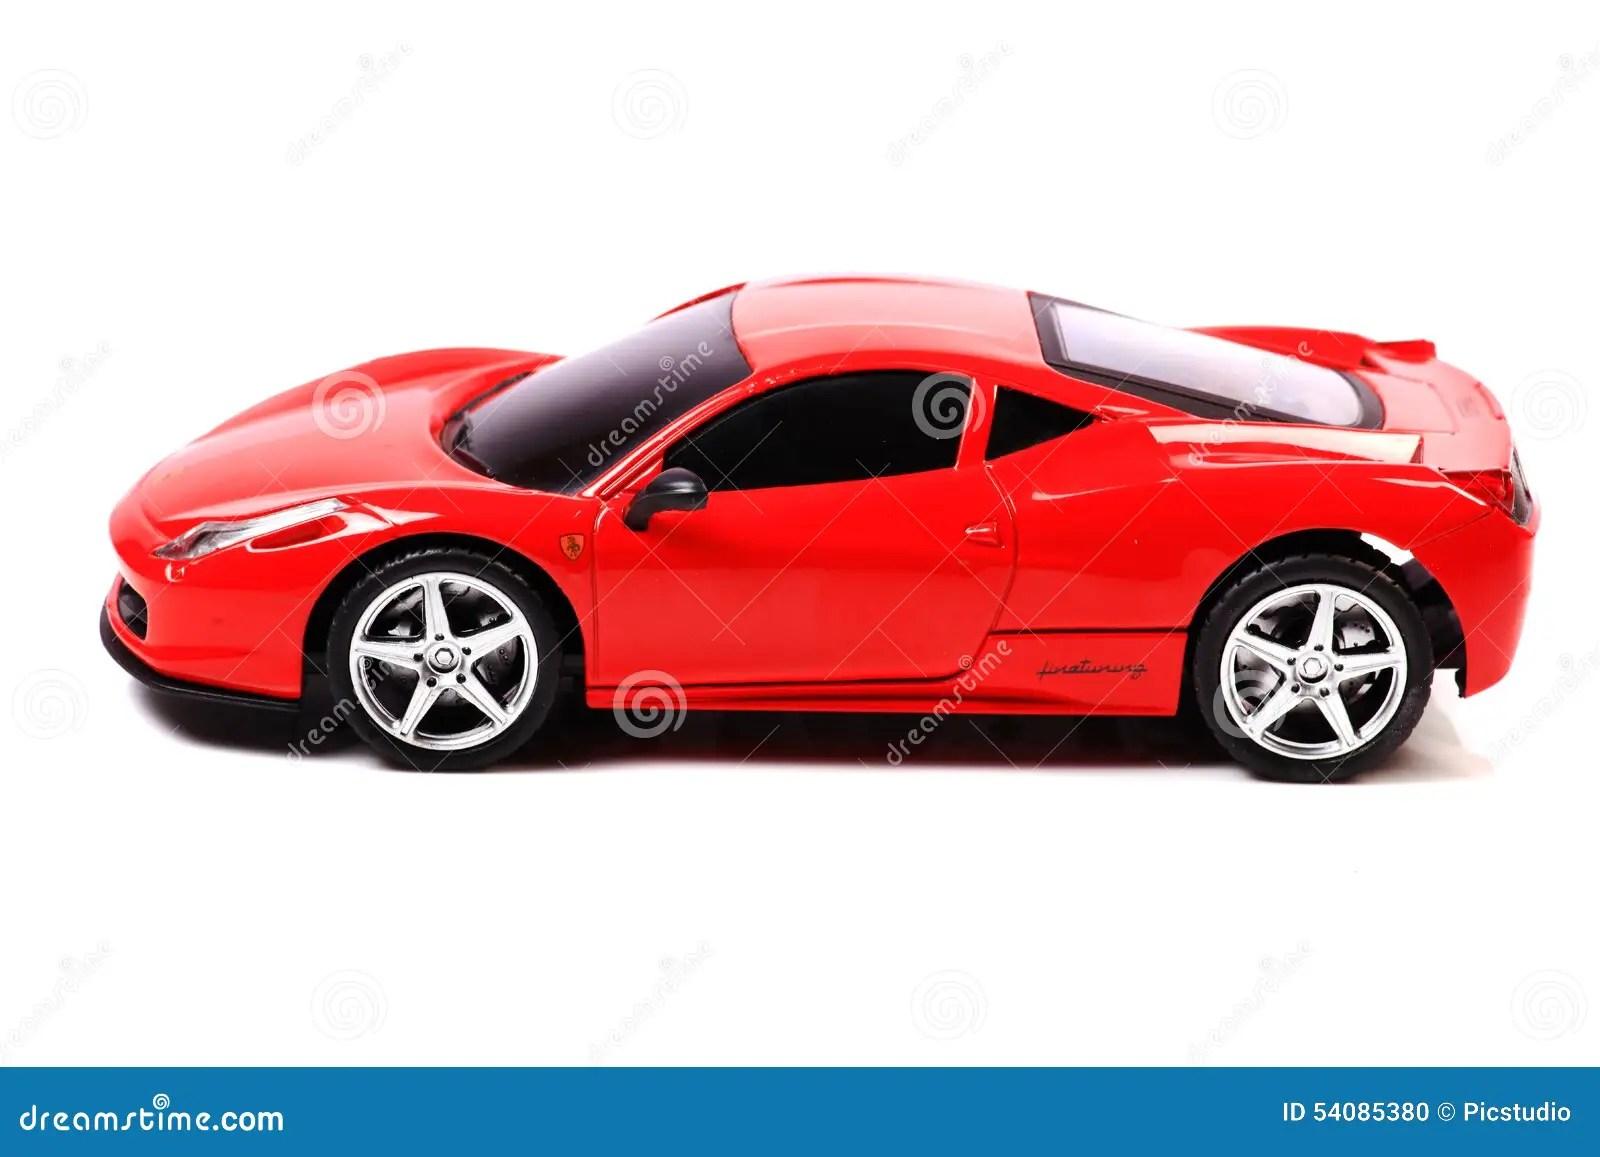 Ferrari 458 Italia In Mille Miglia 2013 Editorial Image